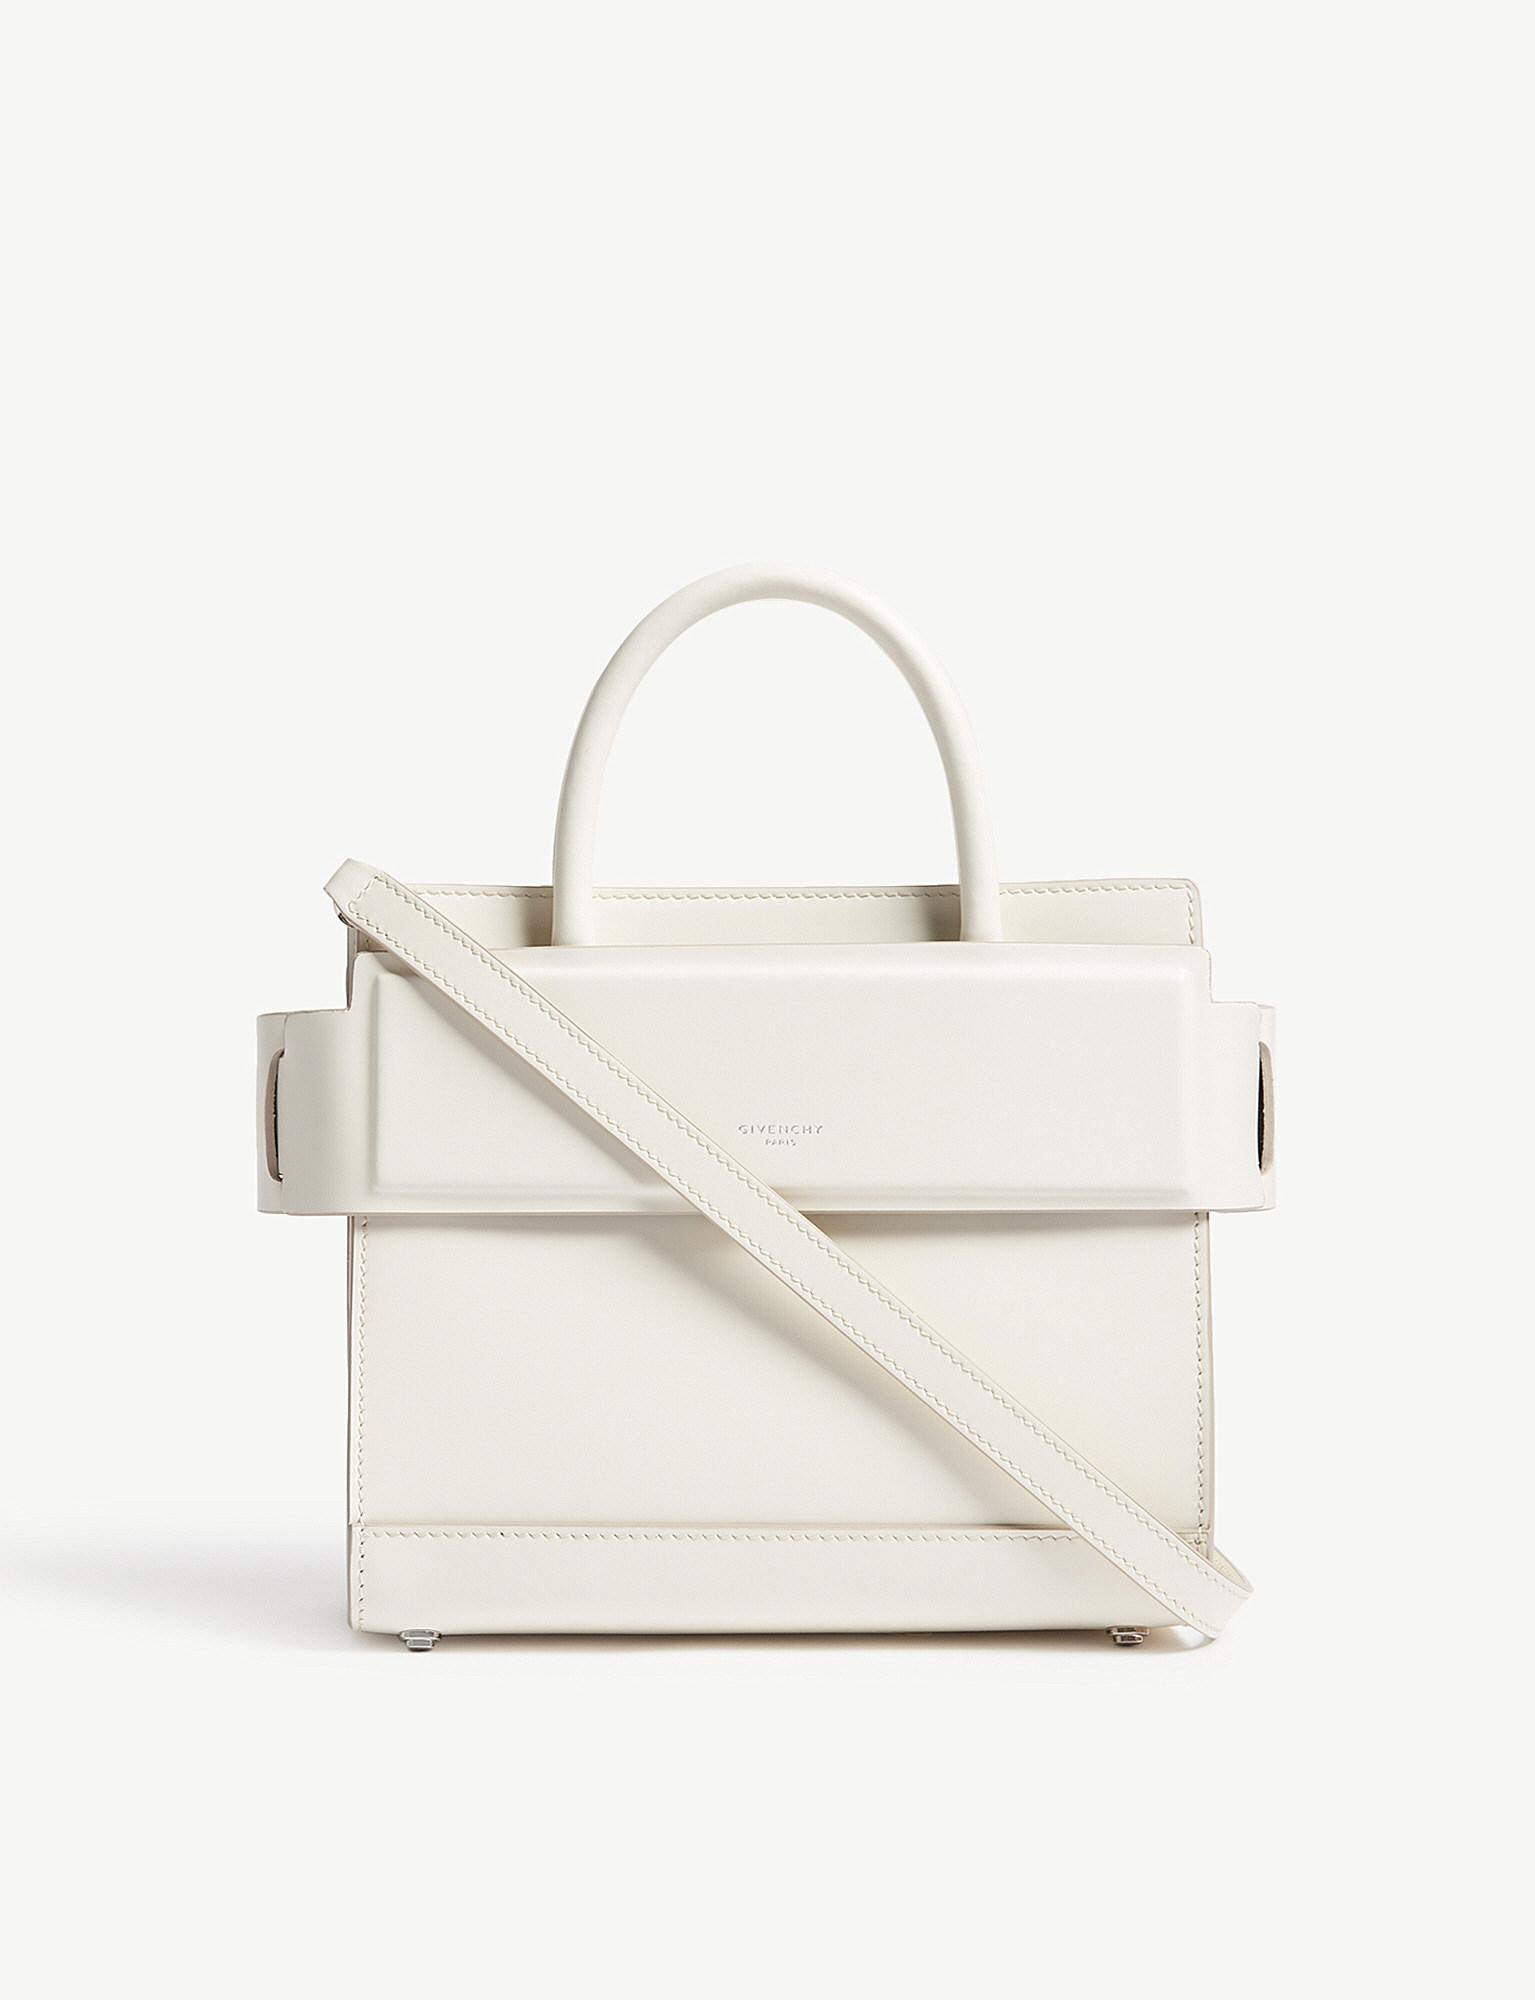 e14b9c01d6f Lyst - Givenchy Horizon Mini Leather Cross-body Bag in White